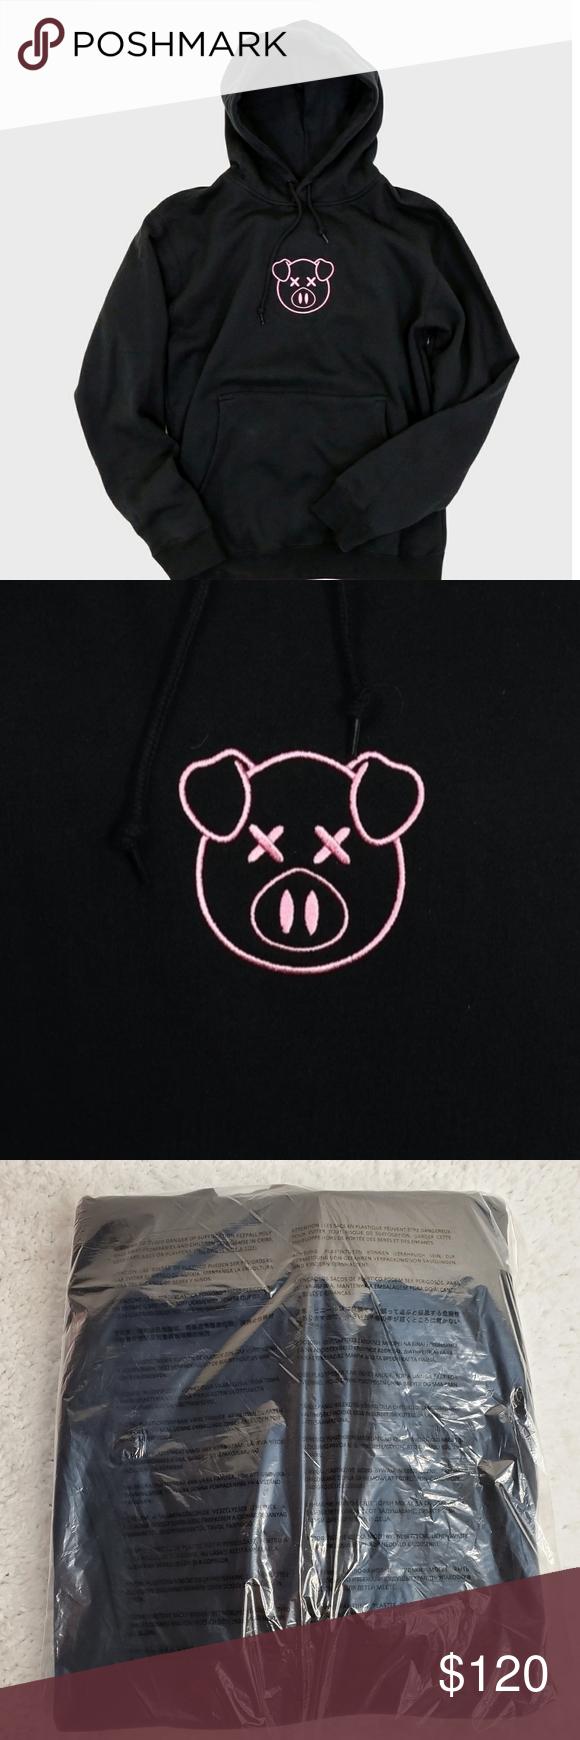 Authentic Shane Dawson Embroidered Pig Logo Hoodie Hoodies Cotton Pullover Sweatshirts Hoodie